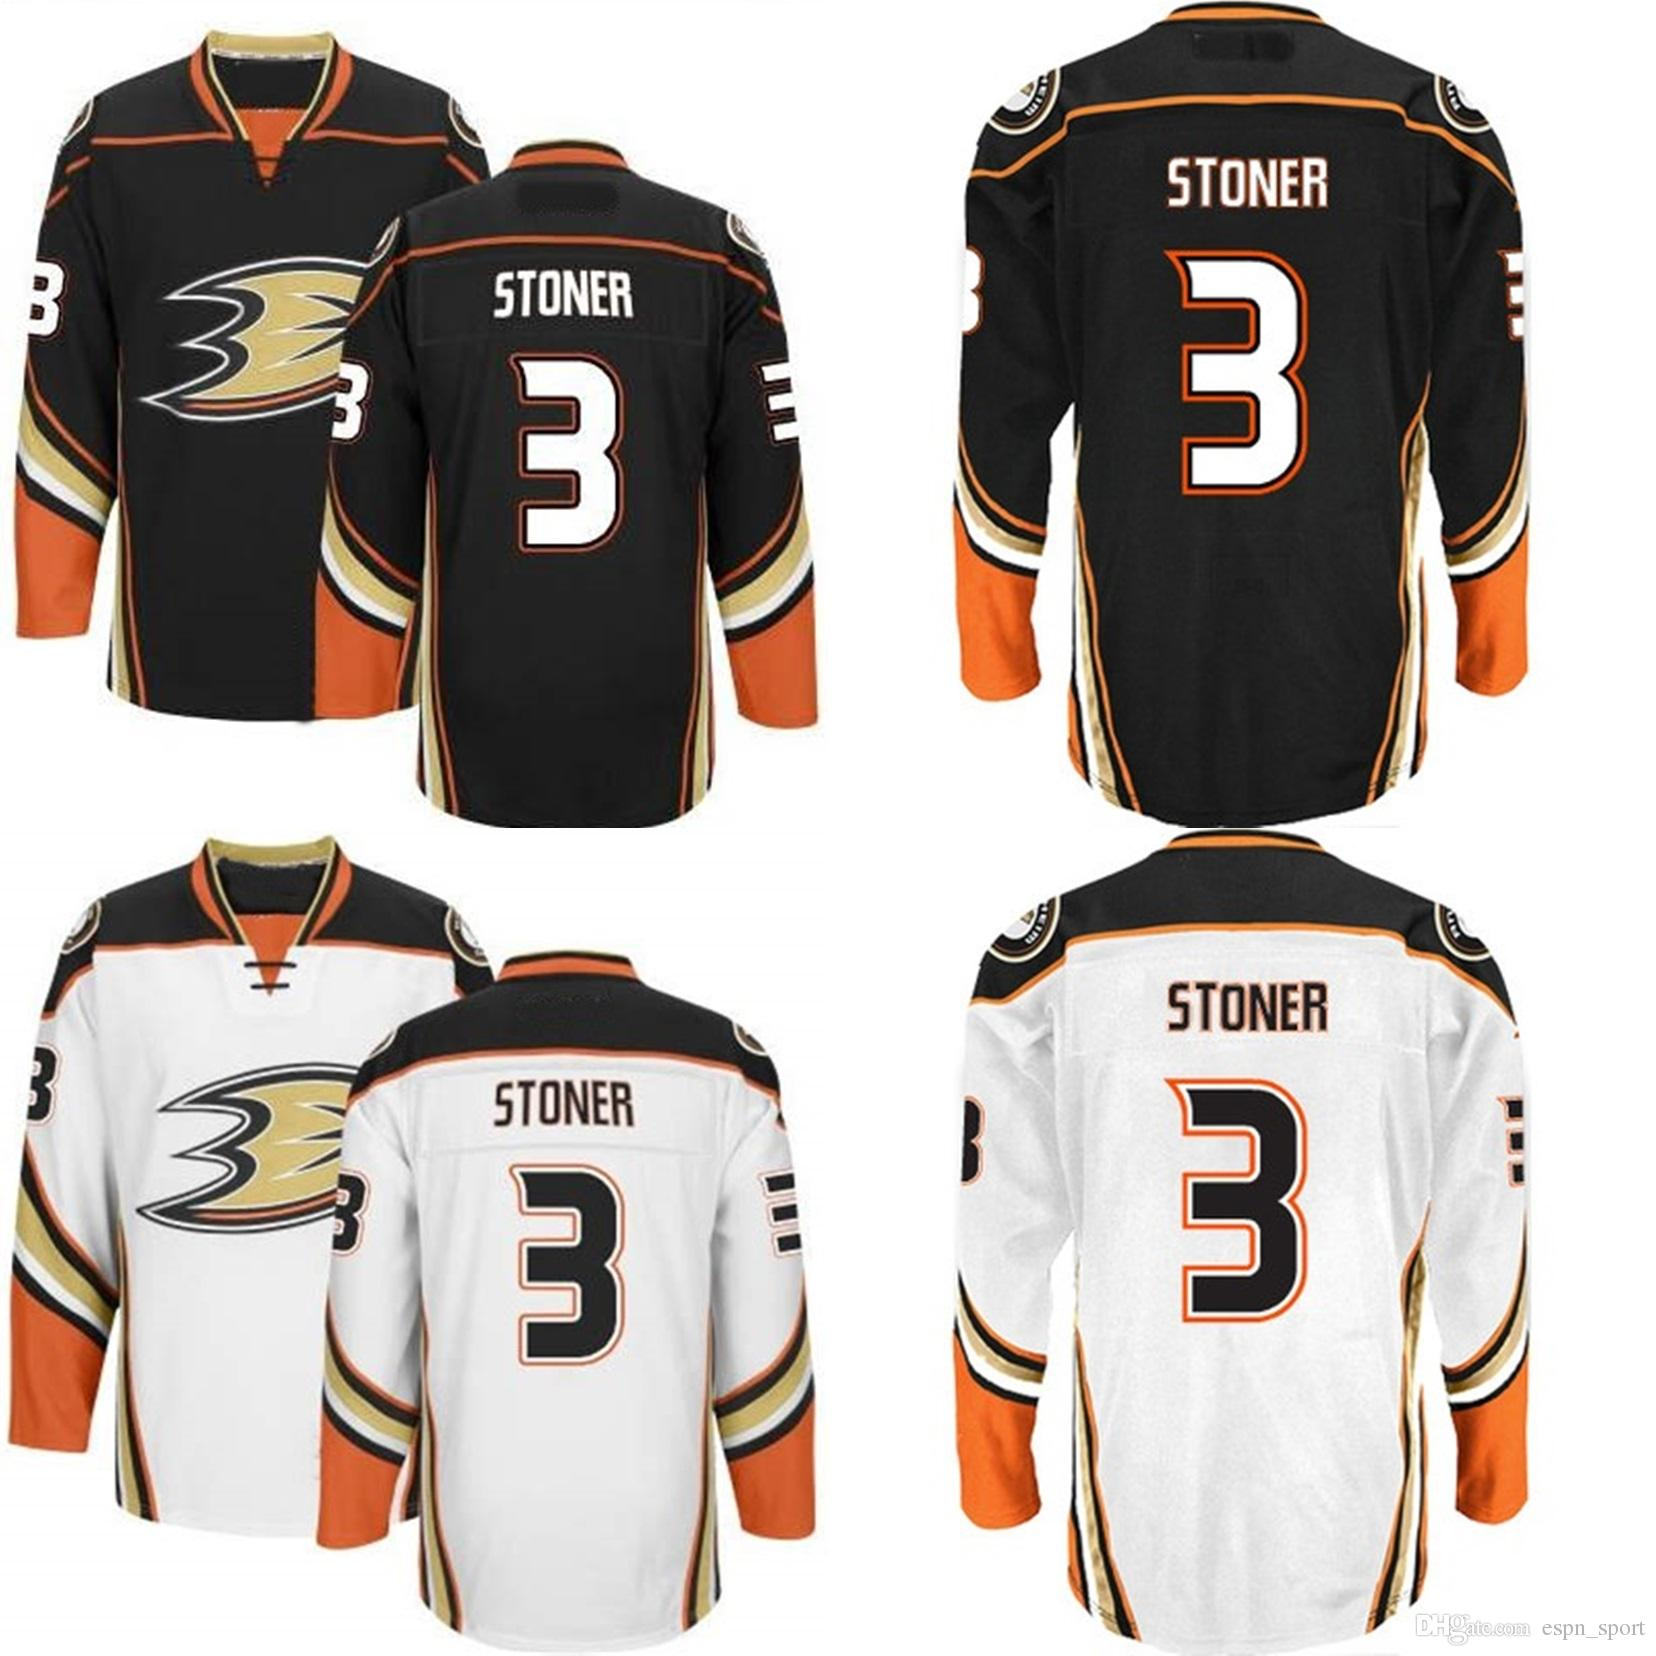 official photos 335a5 5744d clayton stoner ducks jersey